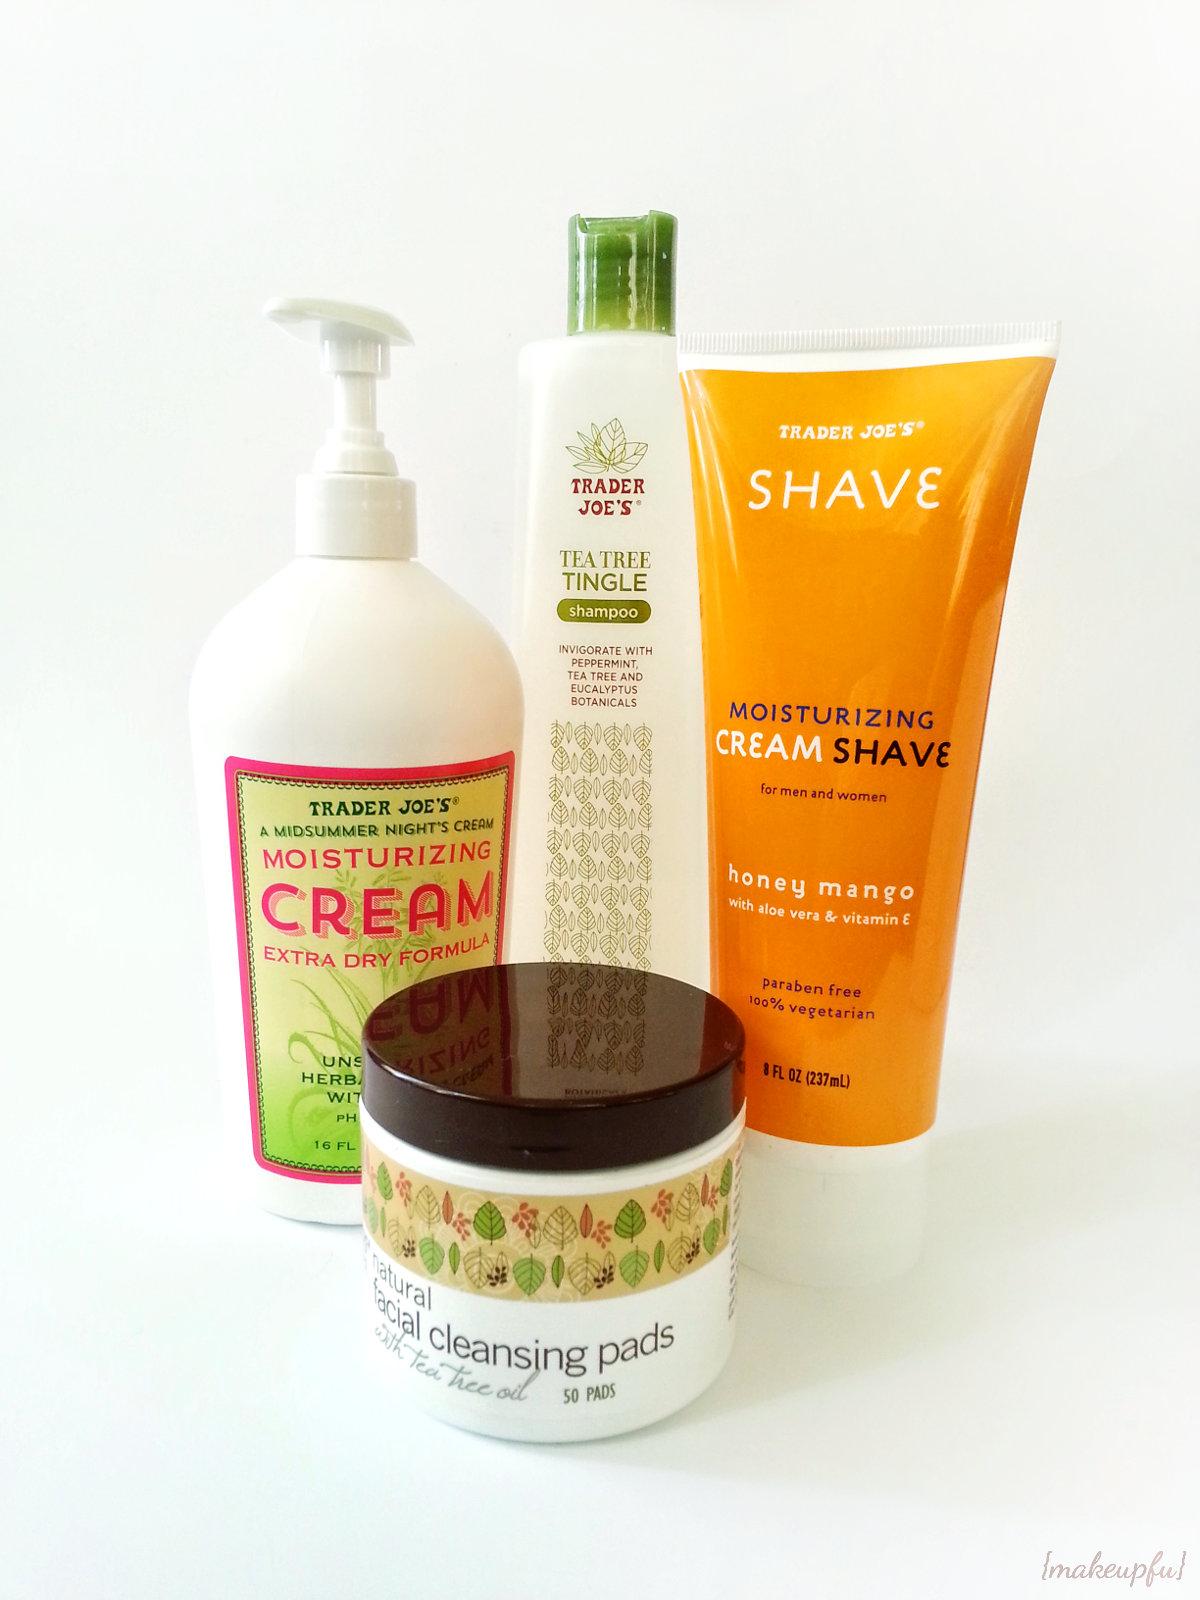 Trader Joe's Tea Tree Tingle Shampoo {Review}   {makeupfu}